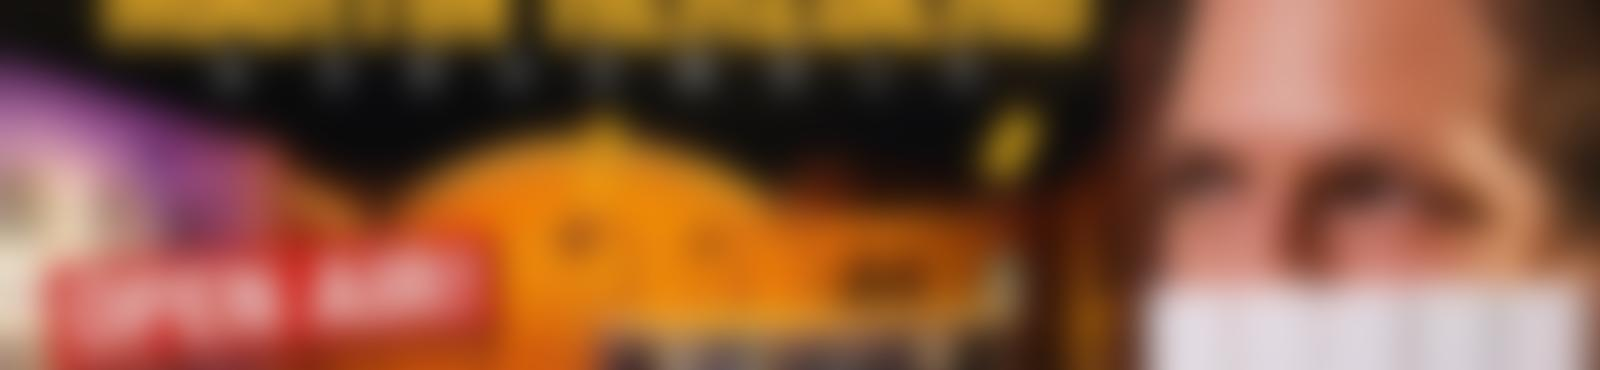 Blurred 0a182e14 bbf5 4ecd bcf4 5fe568b68794